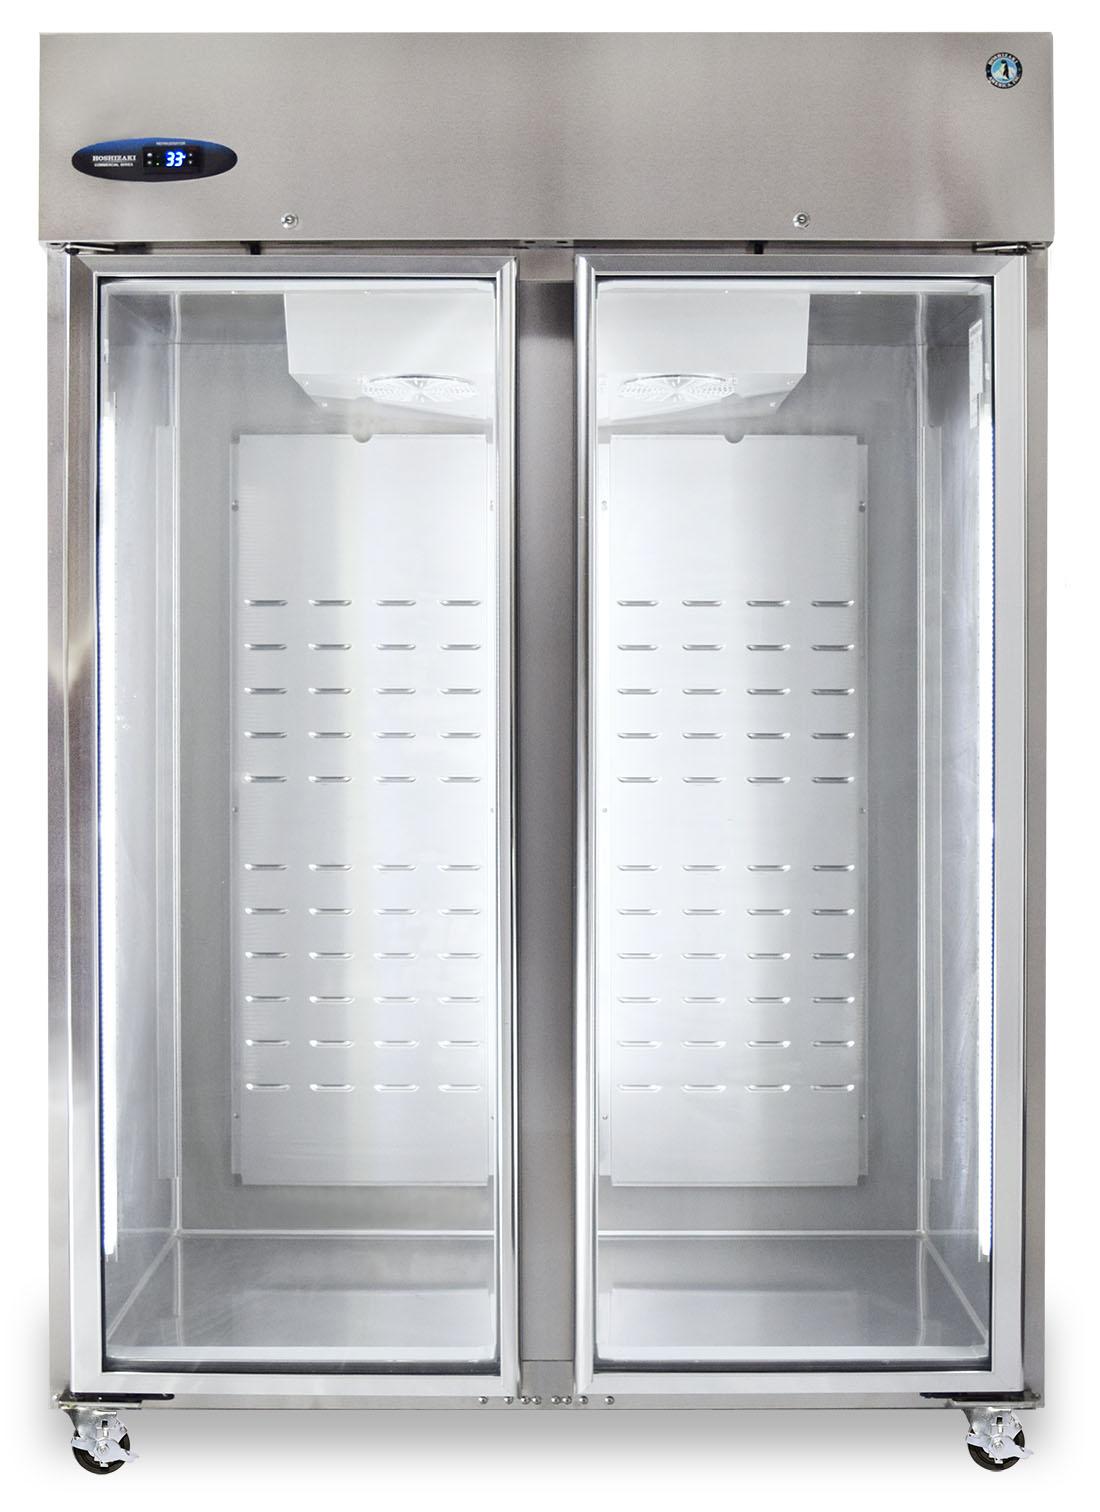 Hoshizaki Cr2s Fge Refrigerator Two Section Upright Full Glass